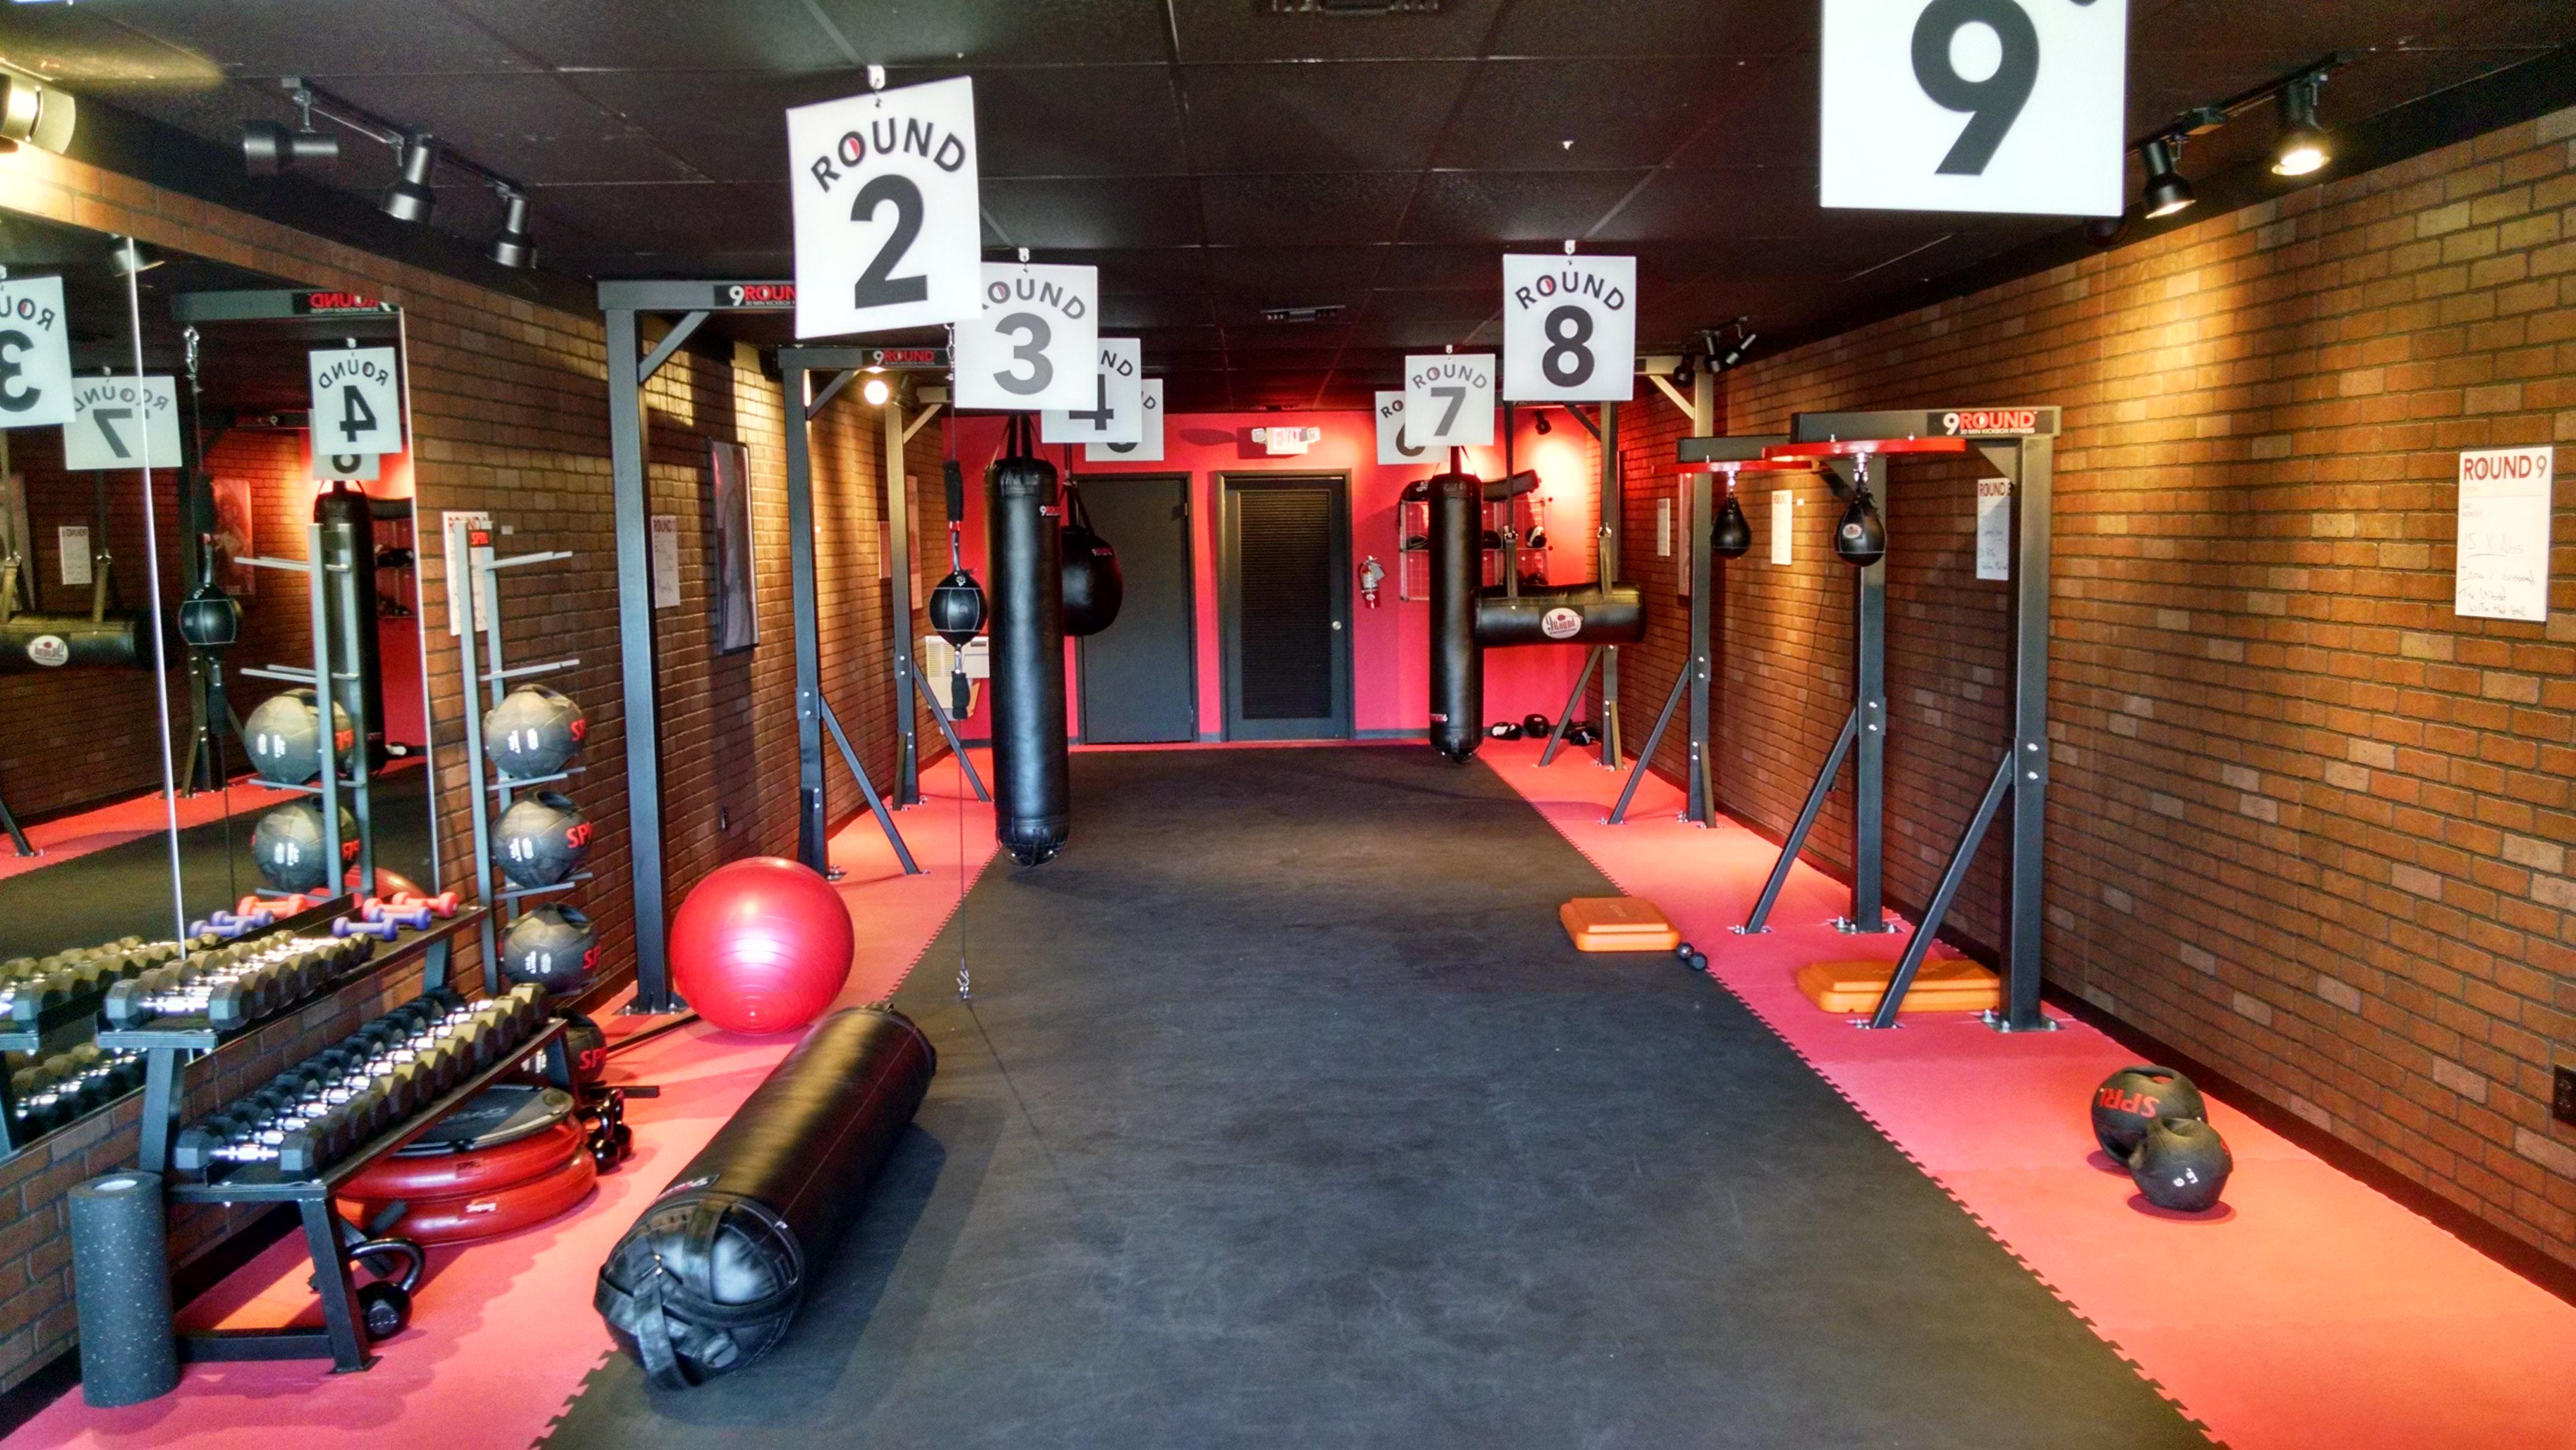 9 Rounds Kickbox Fitness